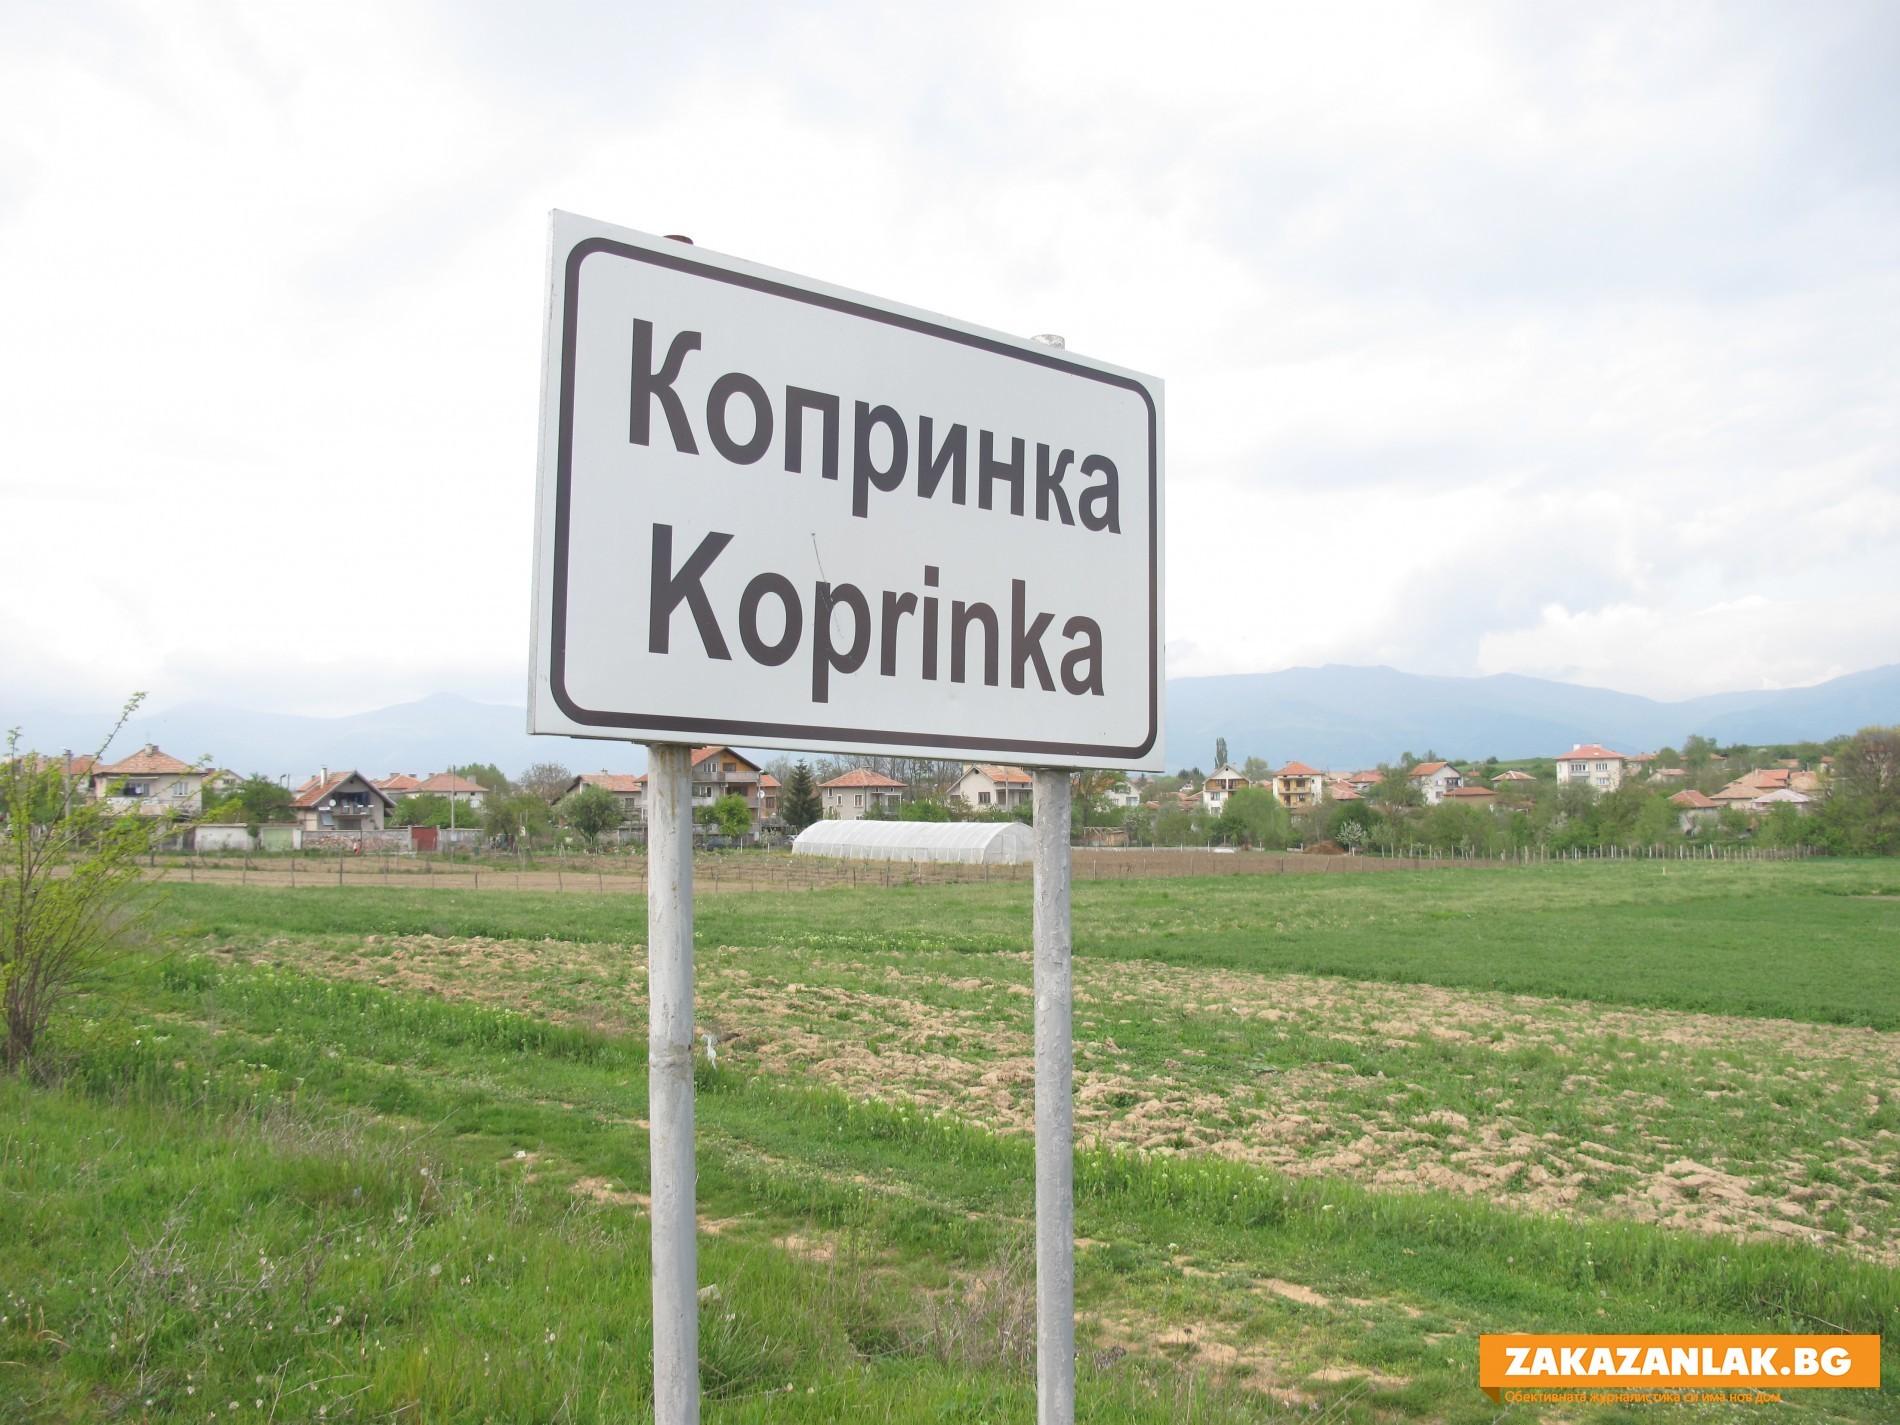 Трима кандидати за кмет на село Копринка